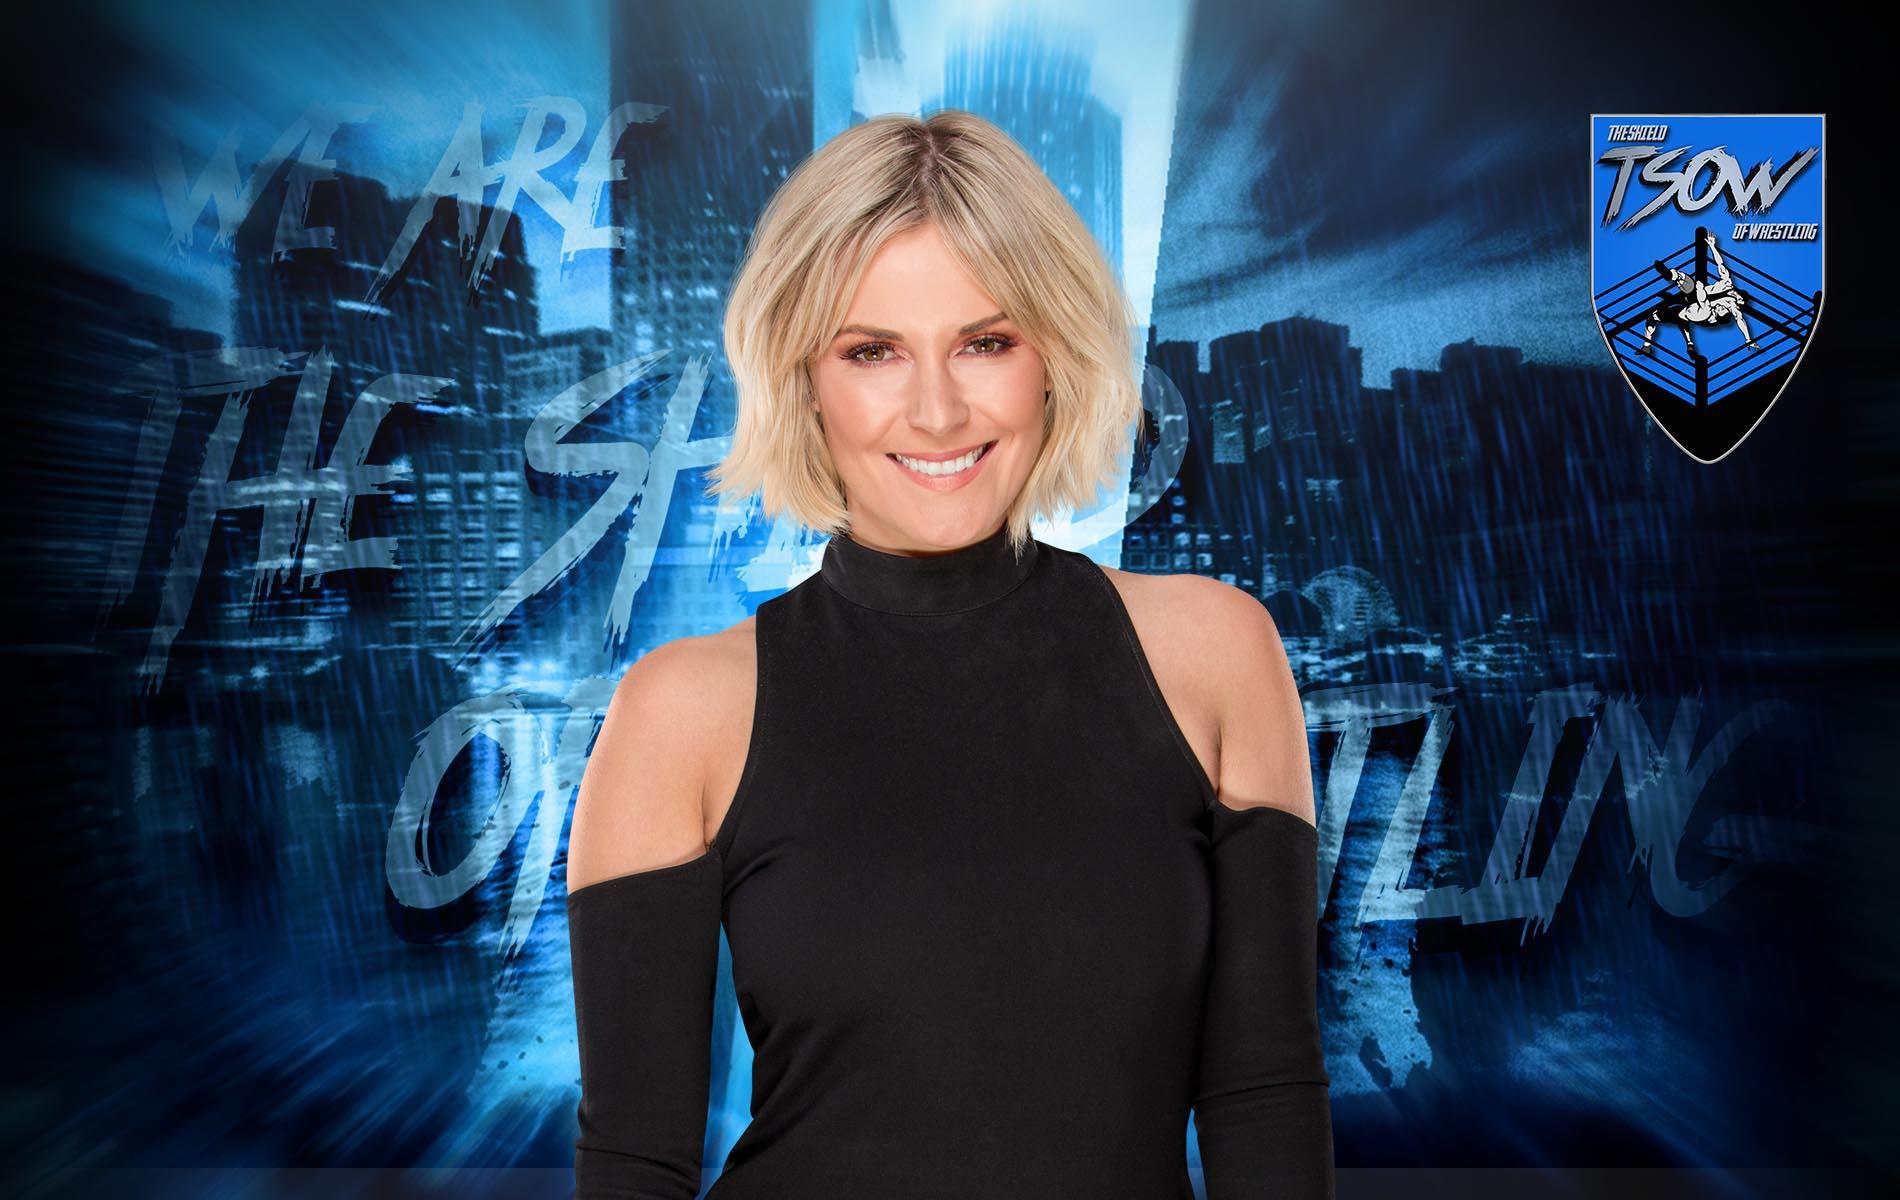 SmackDown Season Premiere: Renee Young è apparsa nel Kickoff